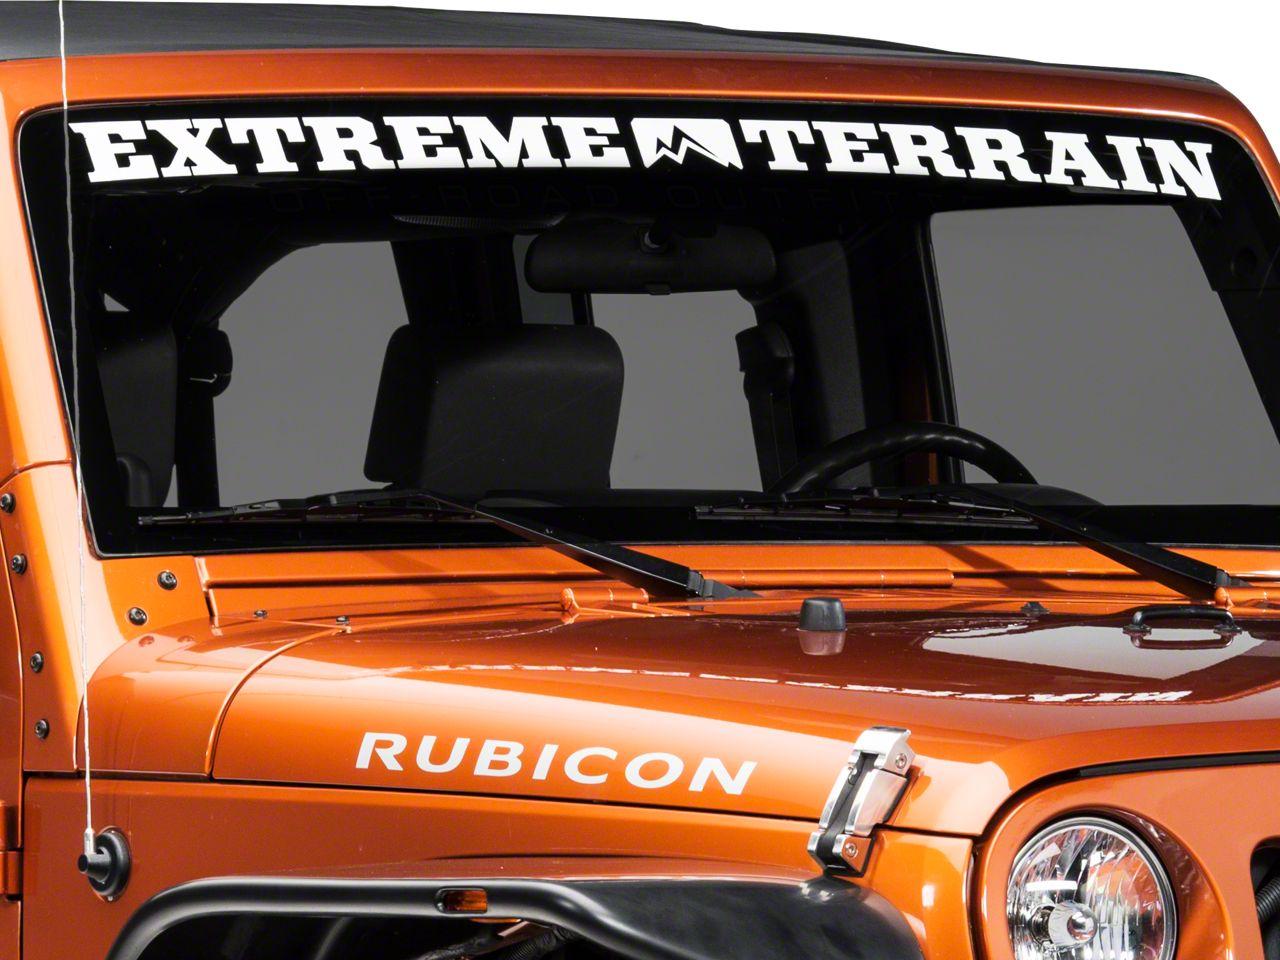 ExtremeTerrain Windshield Banner - White (87-18 Jeep Wrangler YJ, TJ, JK & JL)